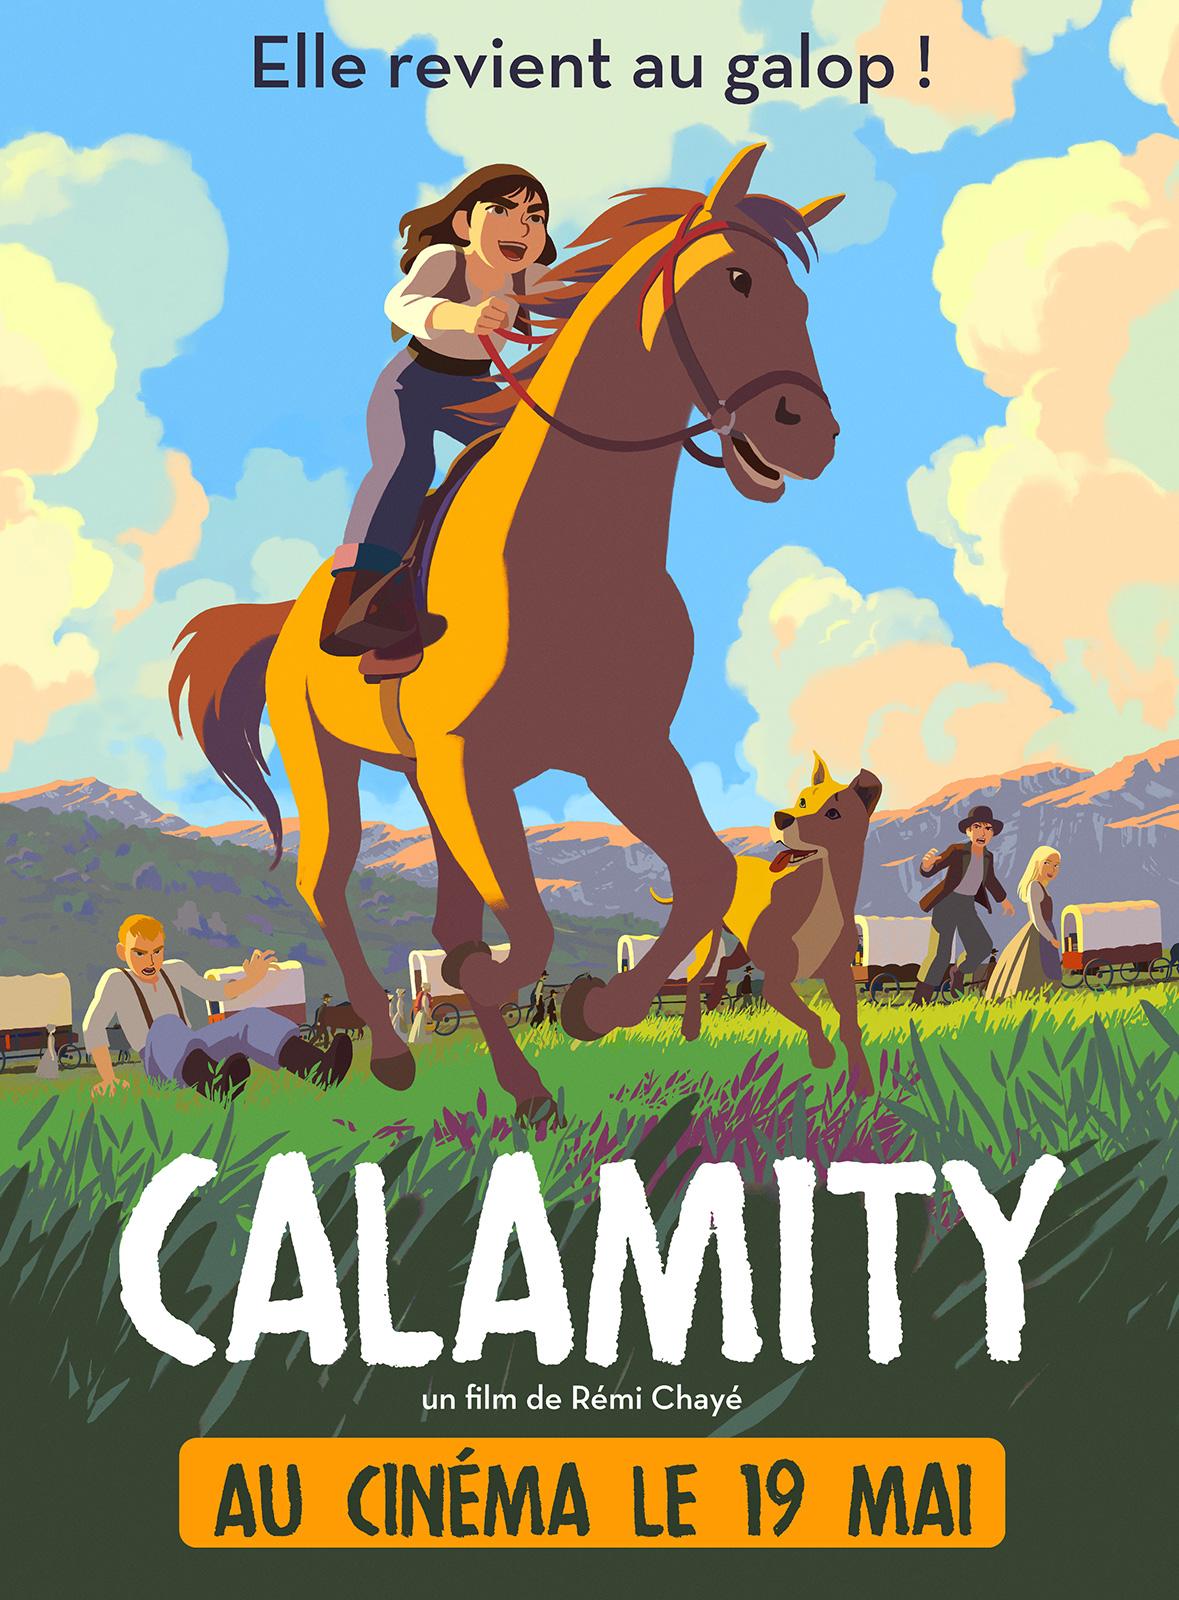 Melun : Calamity, une enfance de Martha Jane Cannary